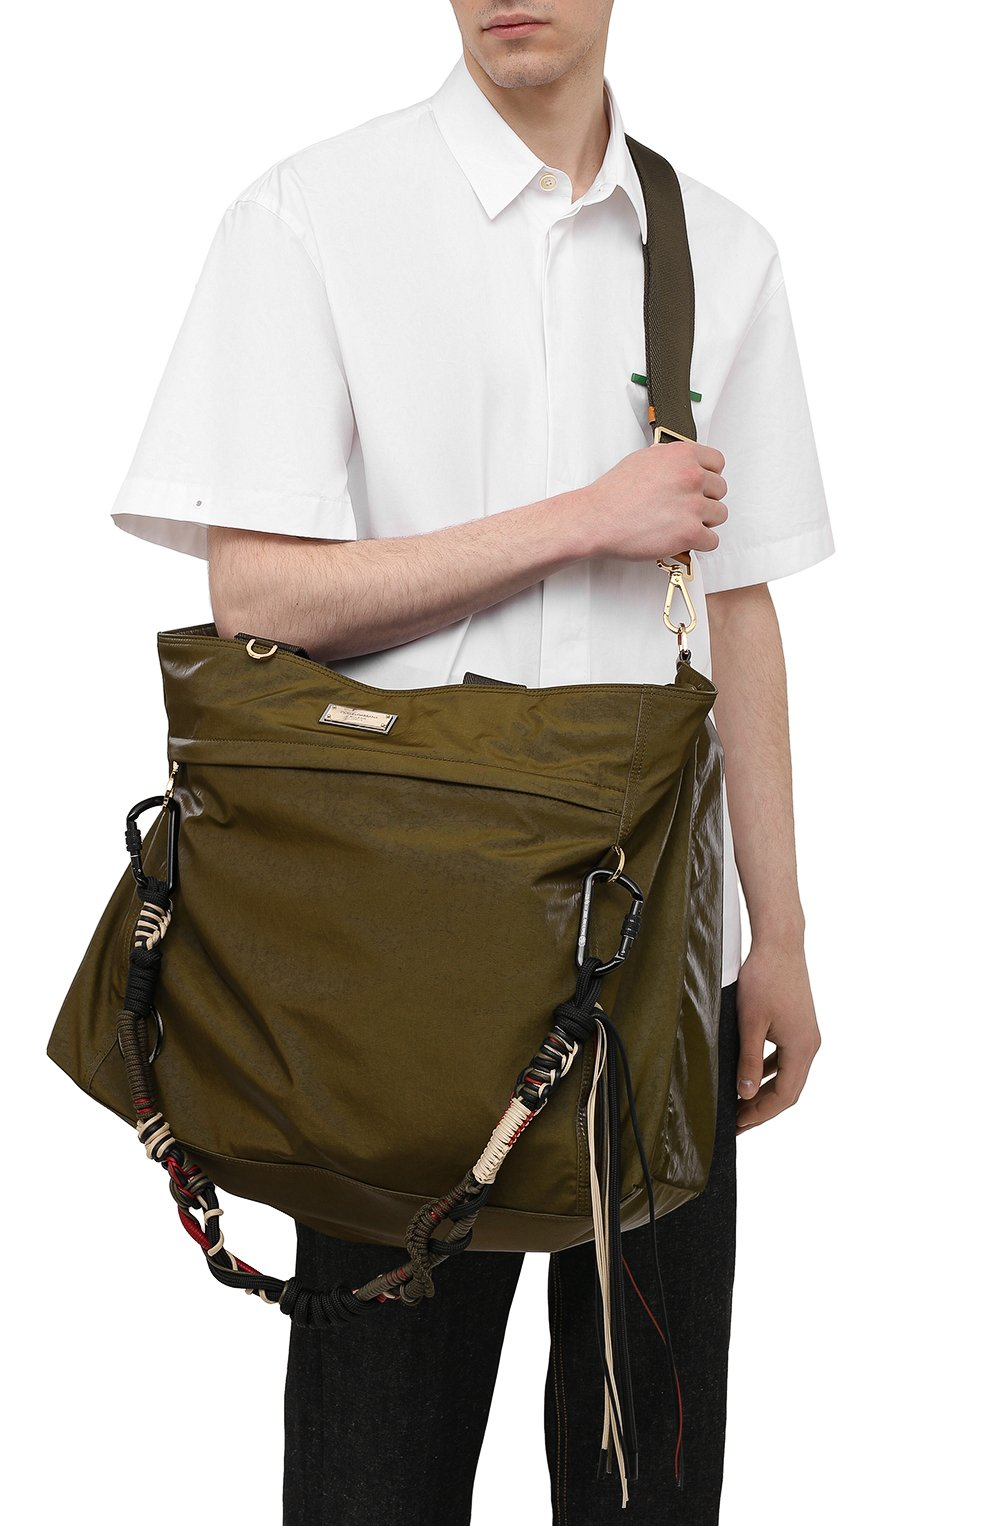 Мужская дорожная сумка nero sicilia dna DOLCE & GABBANA хаки цвета, арт. BM1958/A0244 | Фото 5